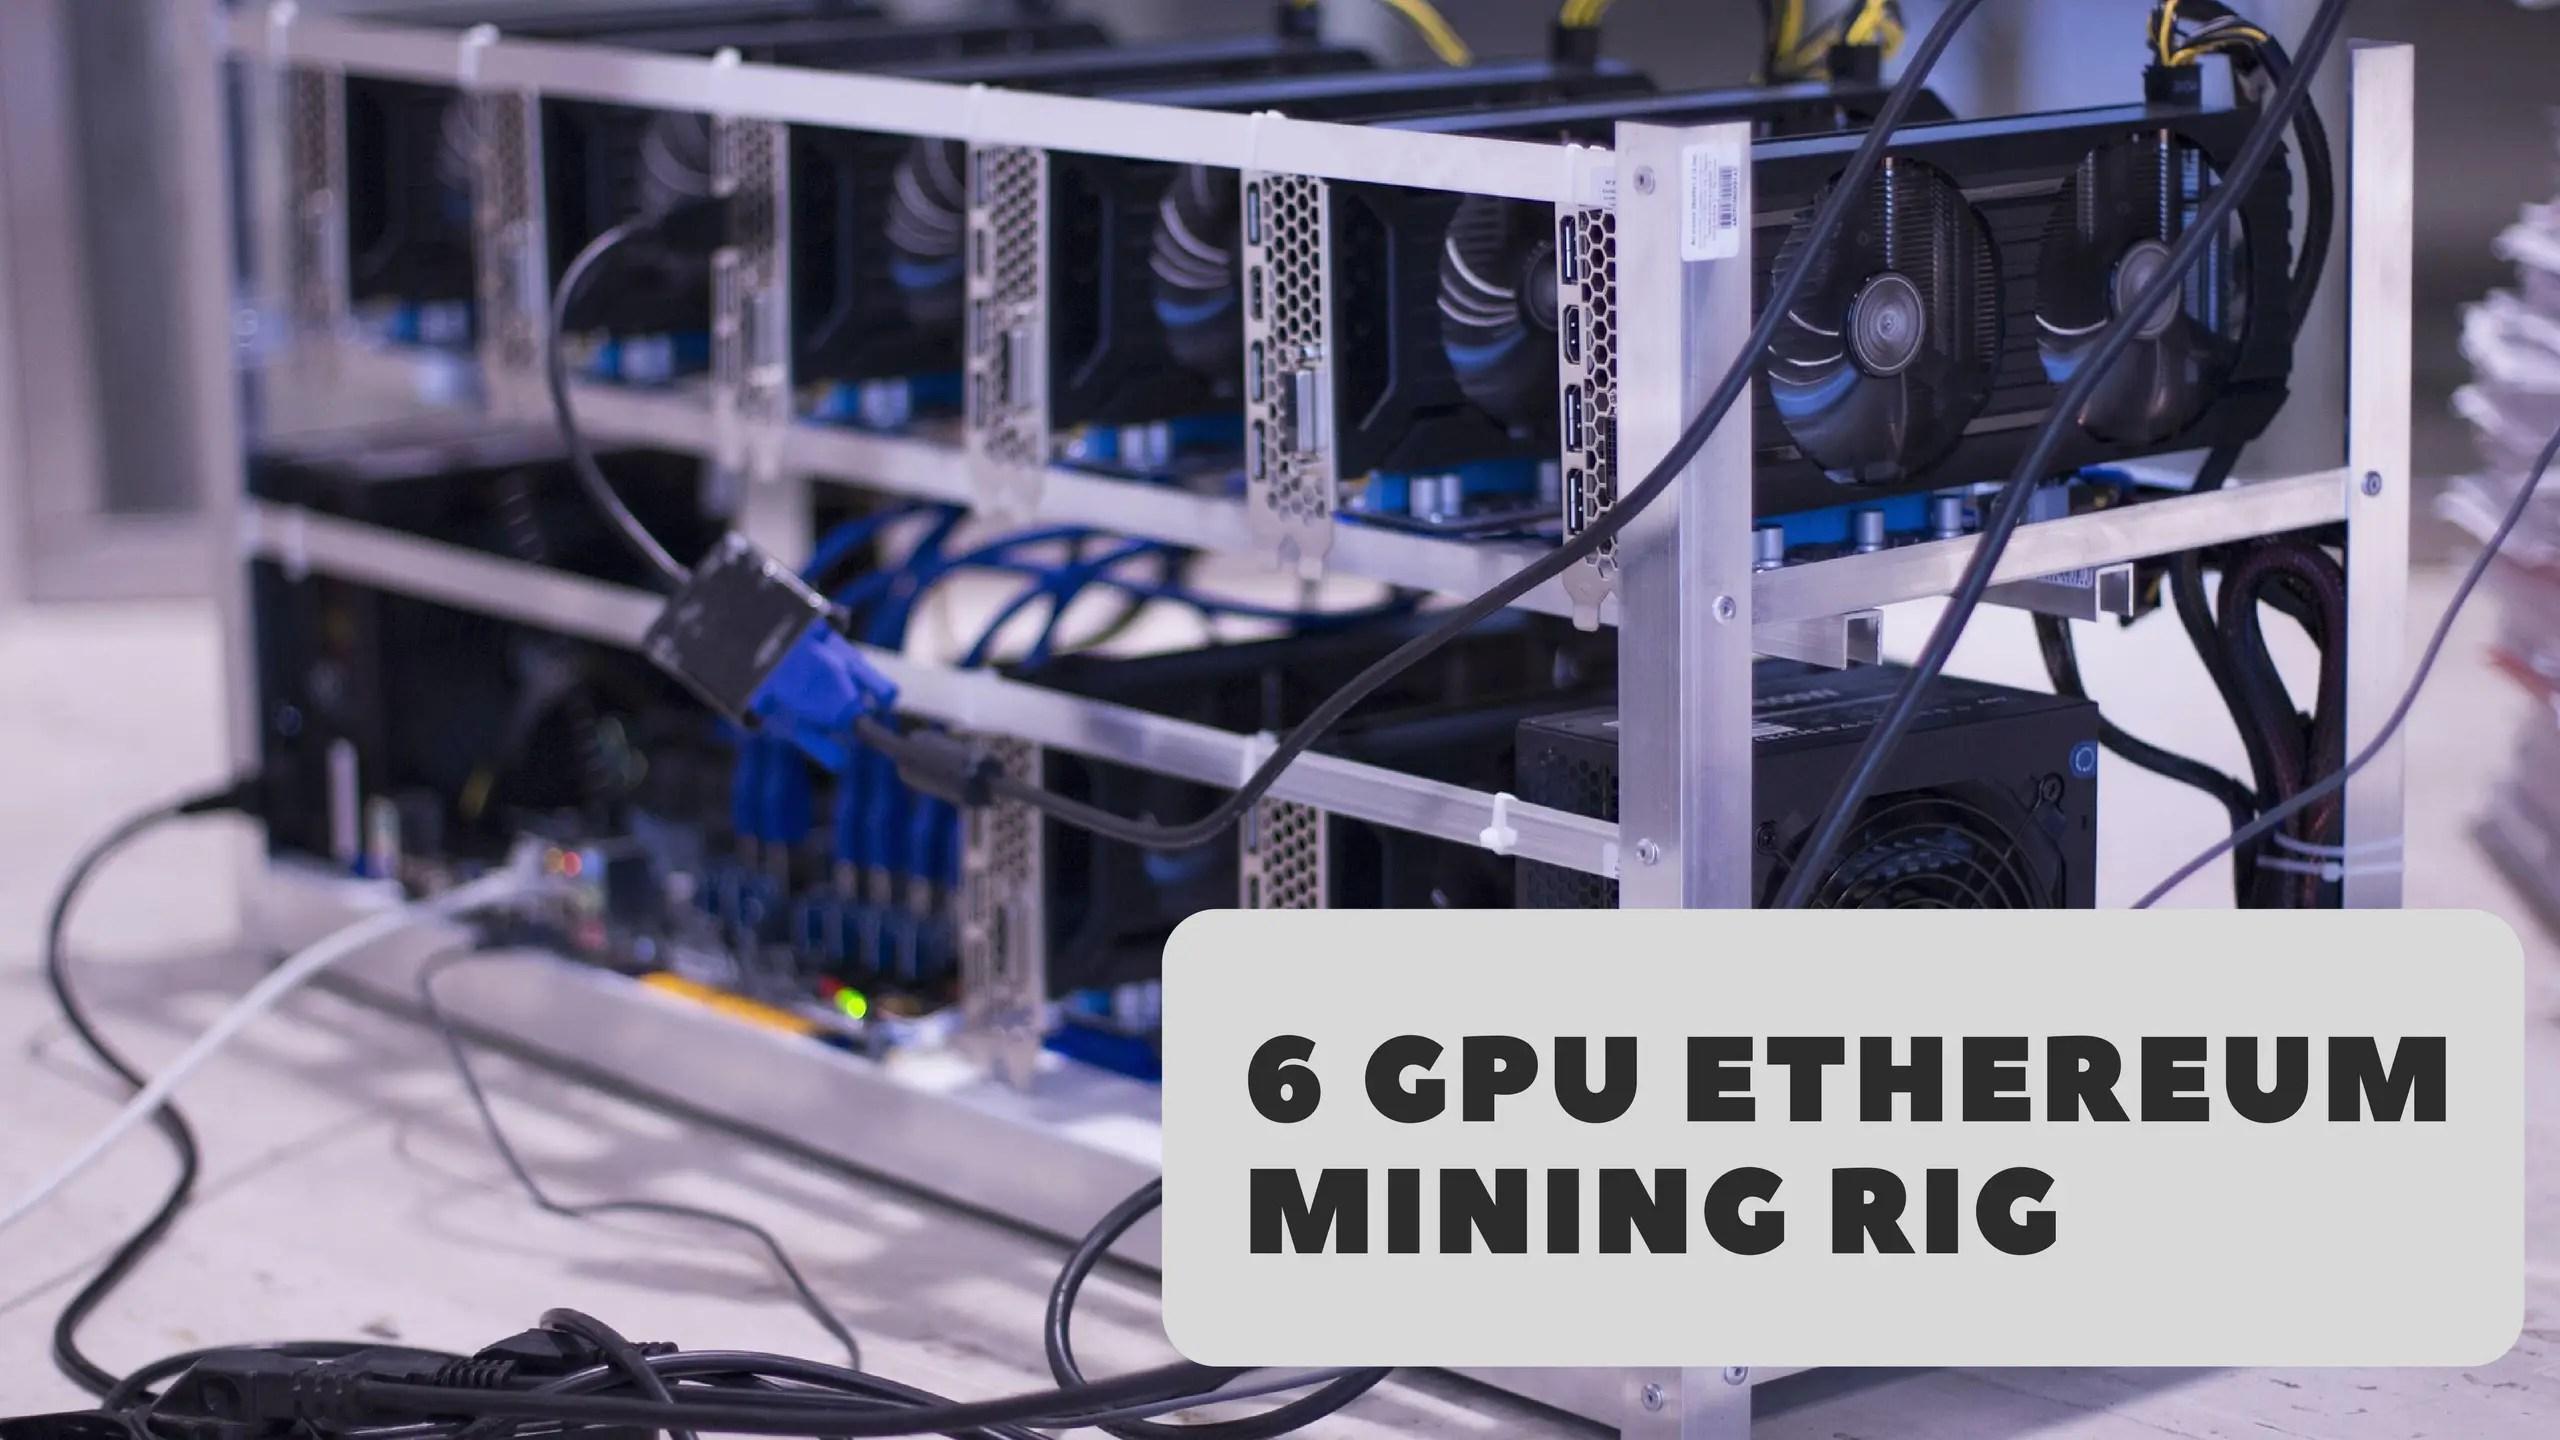 buy ethereum mining rig